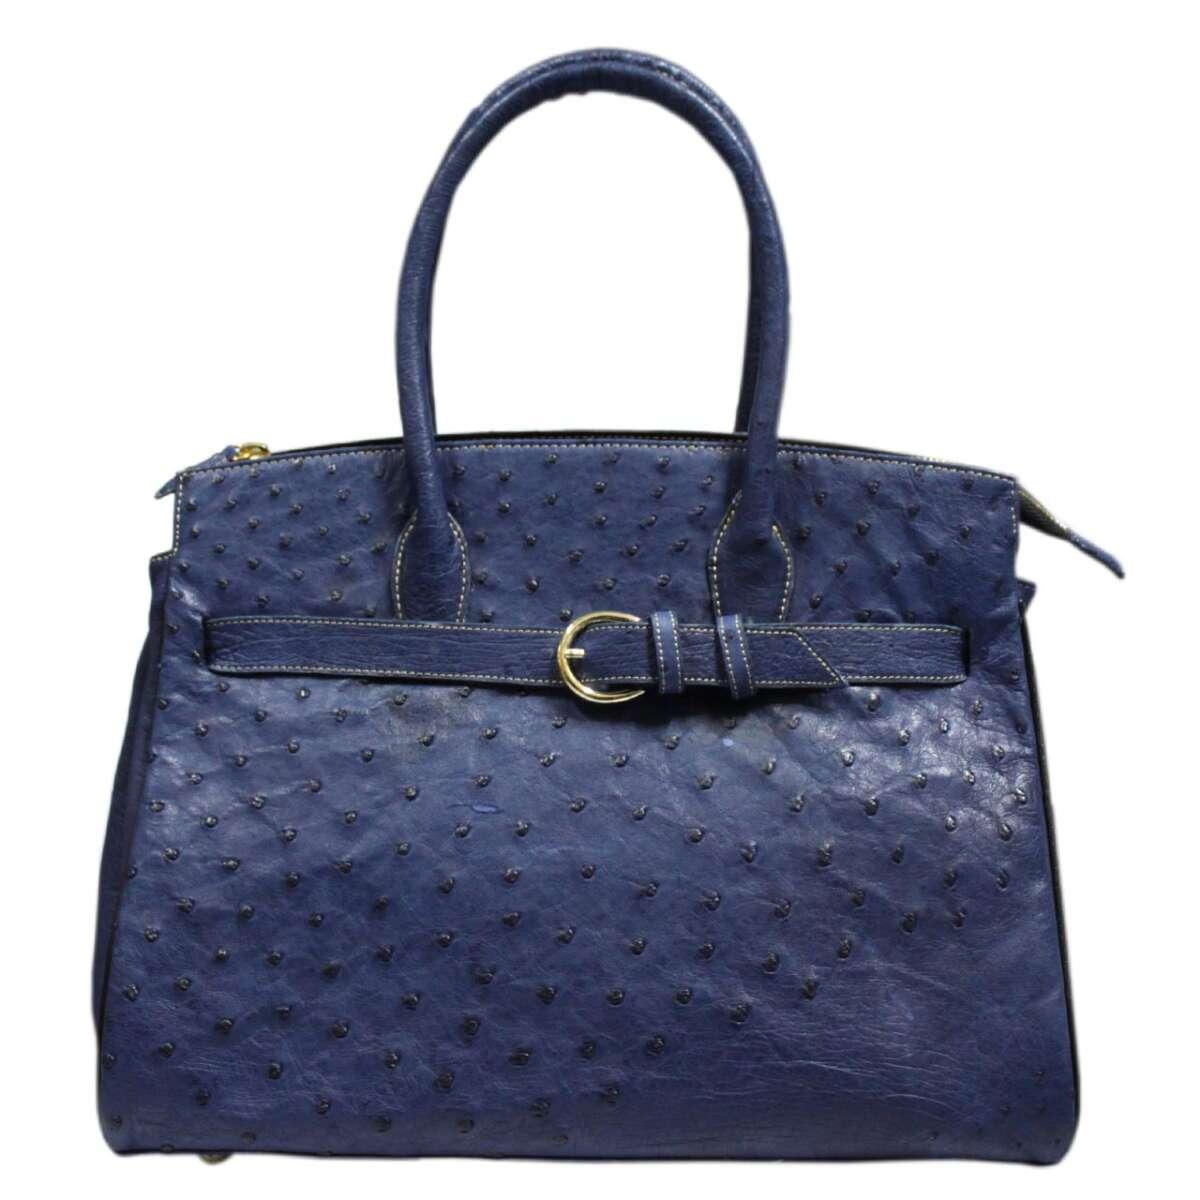 Túi xách nữ da đà điểu E007d